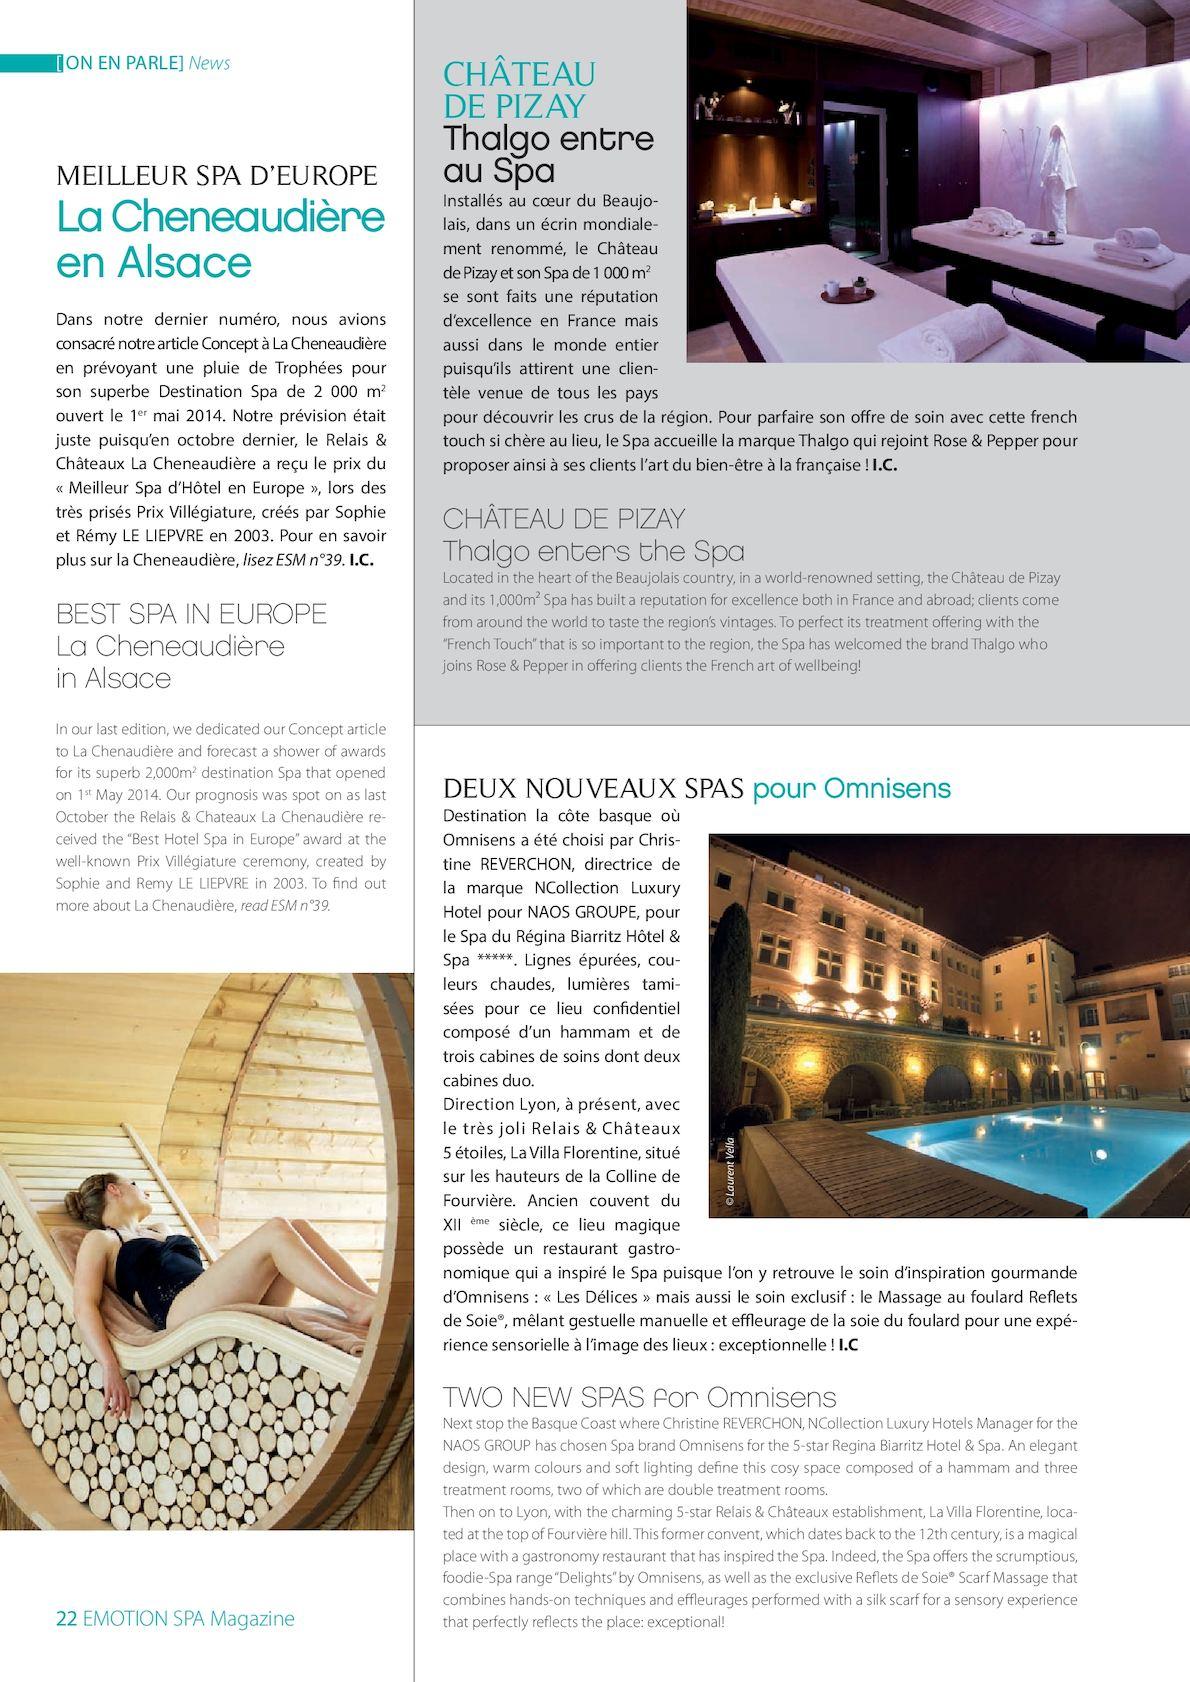 Emotion Spa Magazine 40 Calameo Downloader